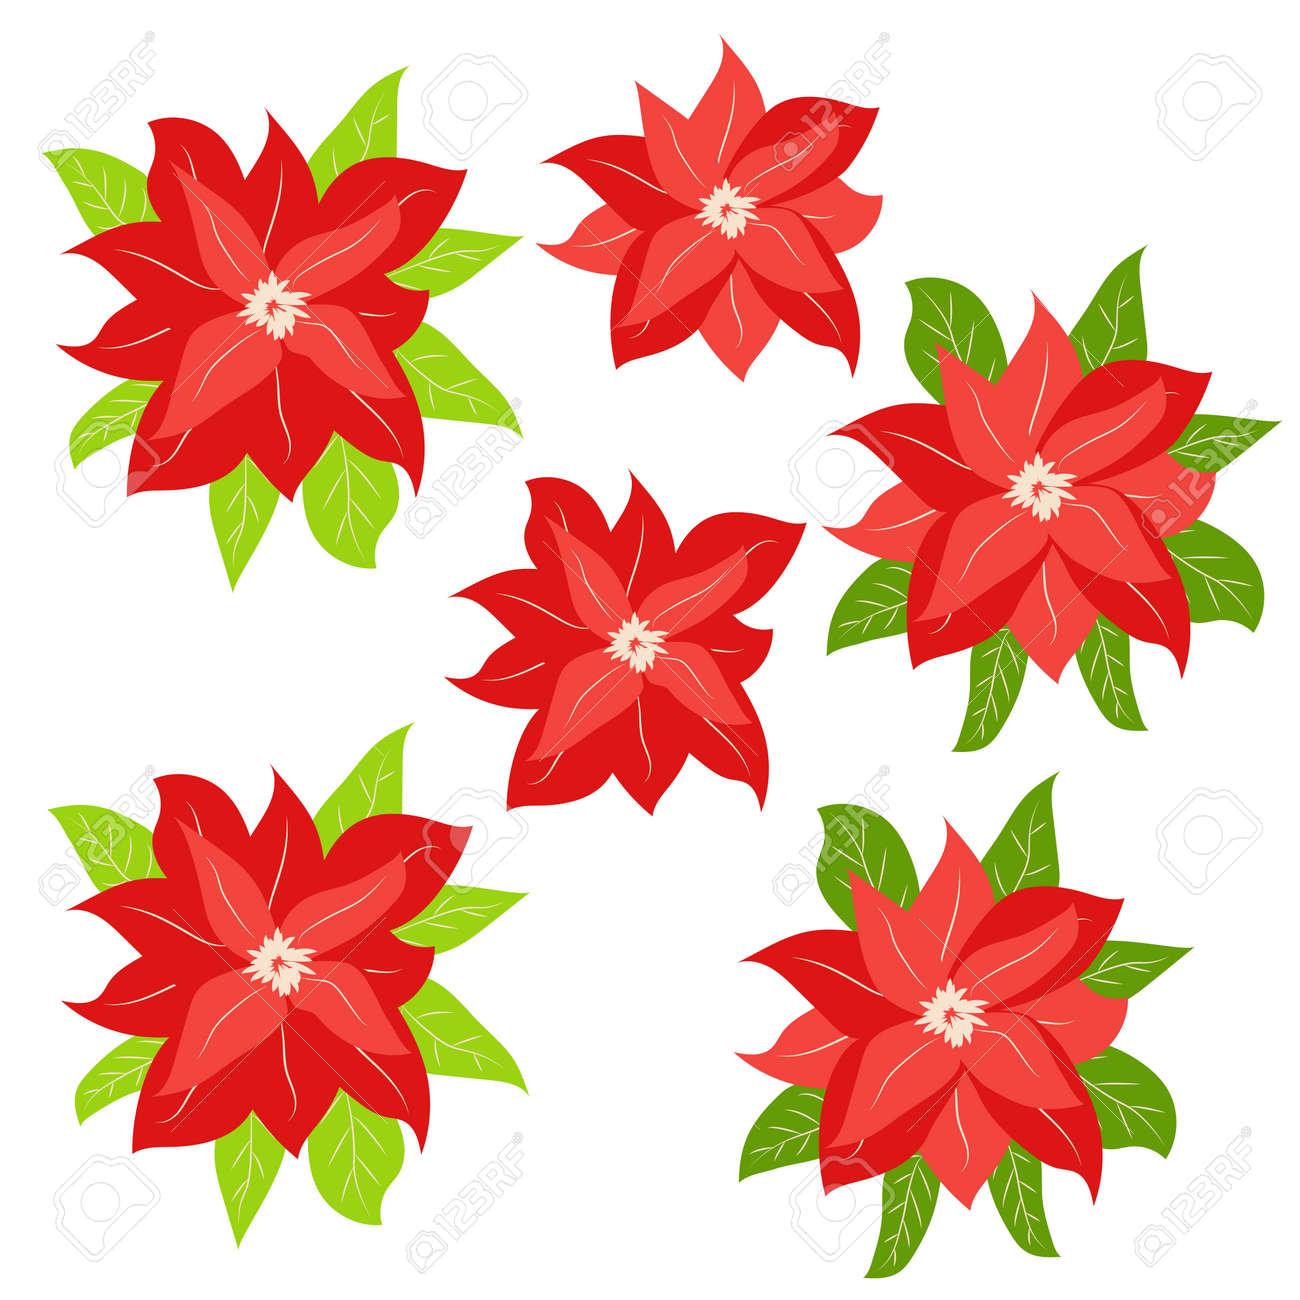 Hand drawn Poinsettia, Christmas Star. Christmas and holiday decor - 170465902